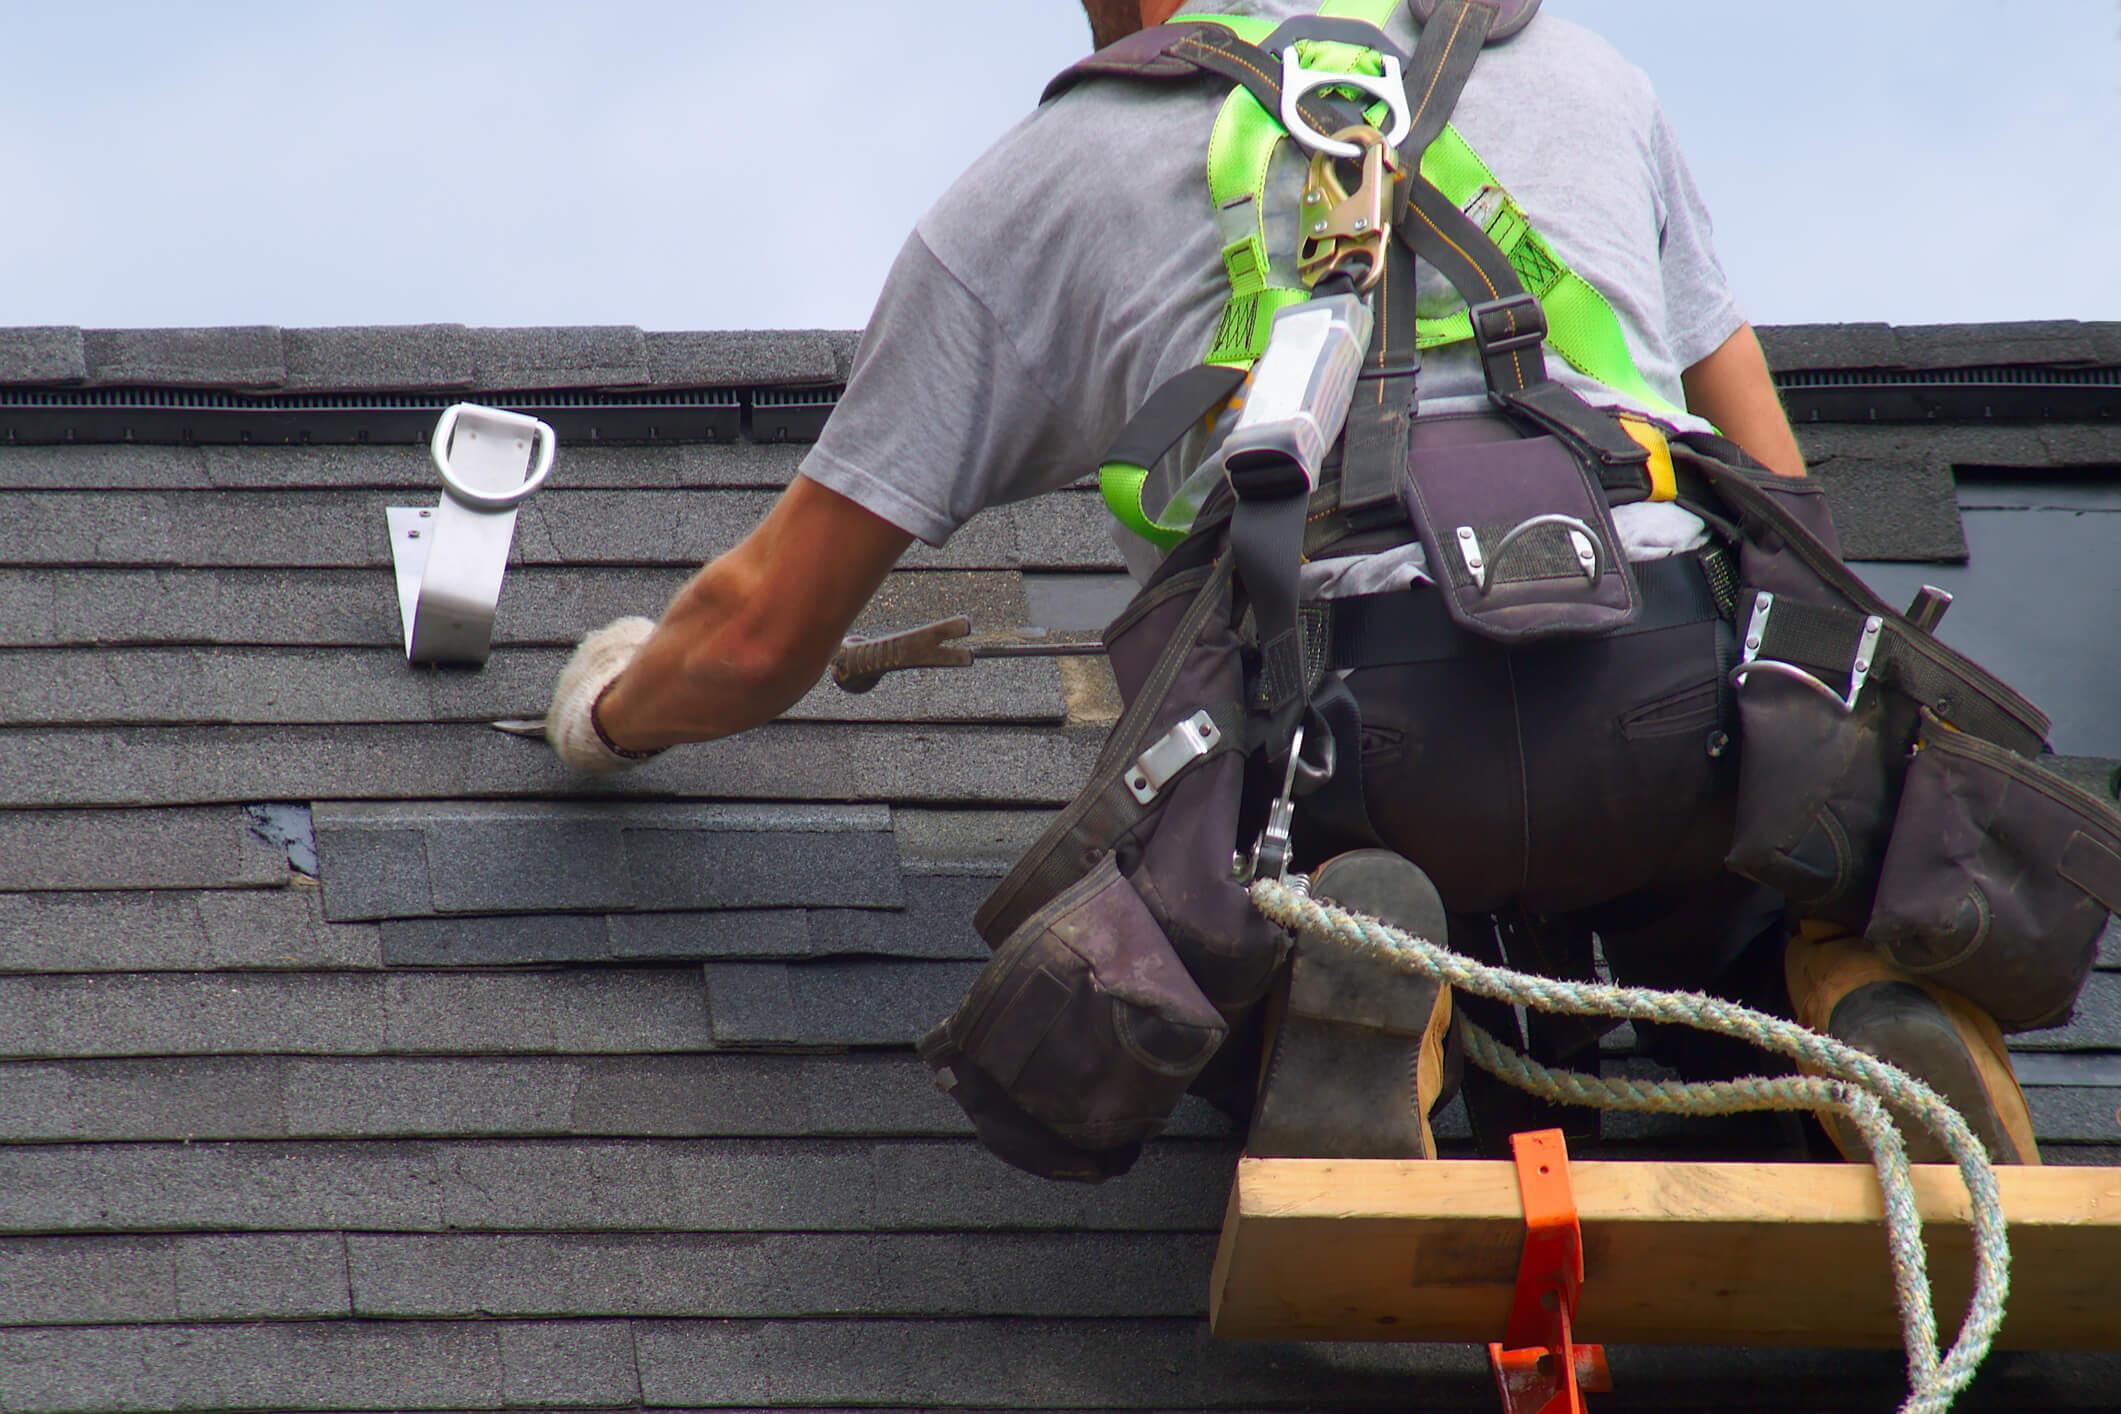 roof repair construction worker